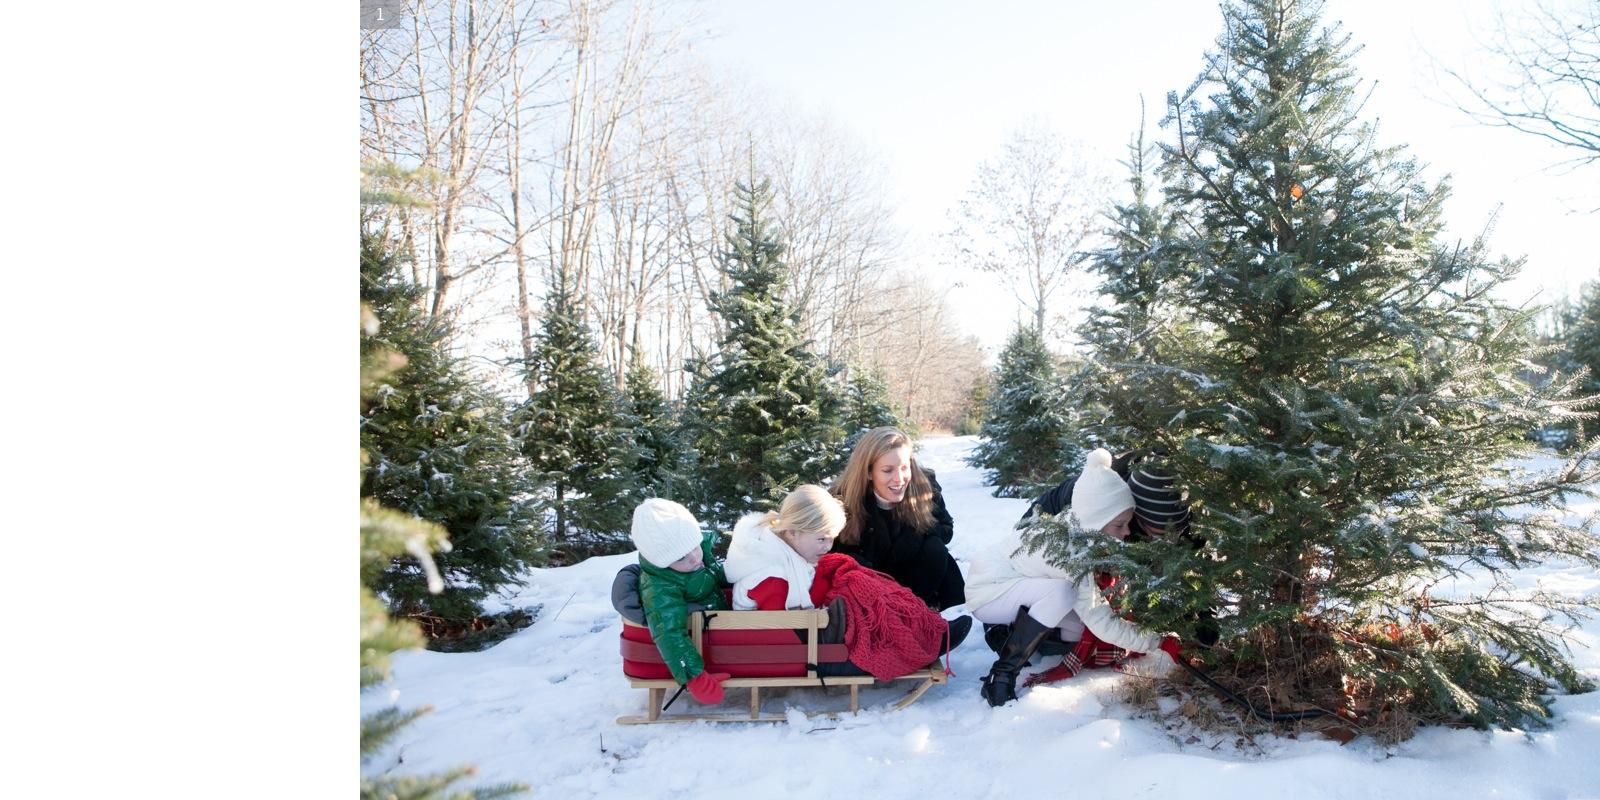 <b>CHRISTMAS TREE</b><br>Schneider Family